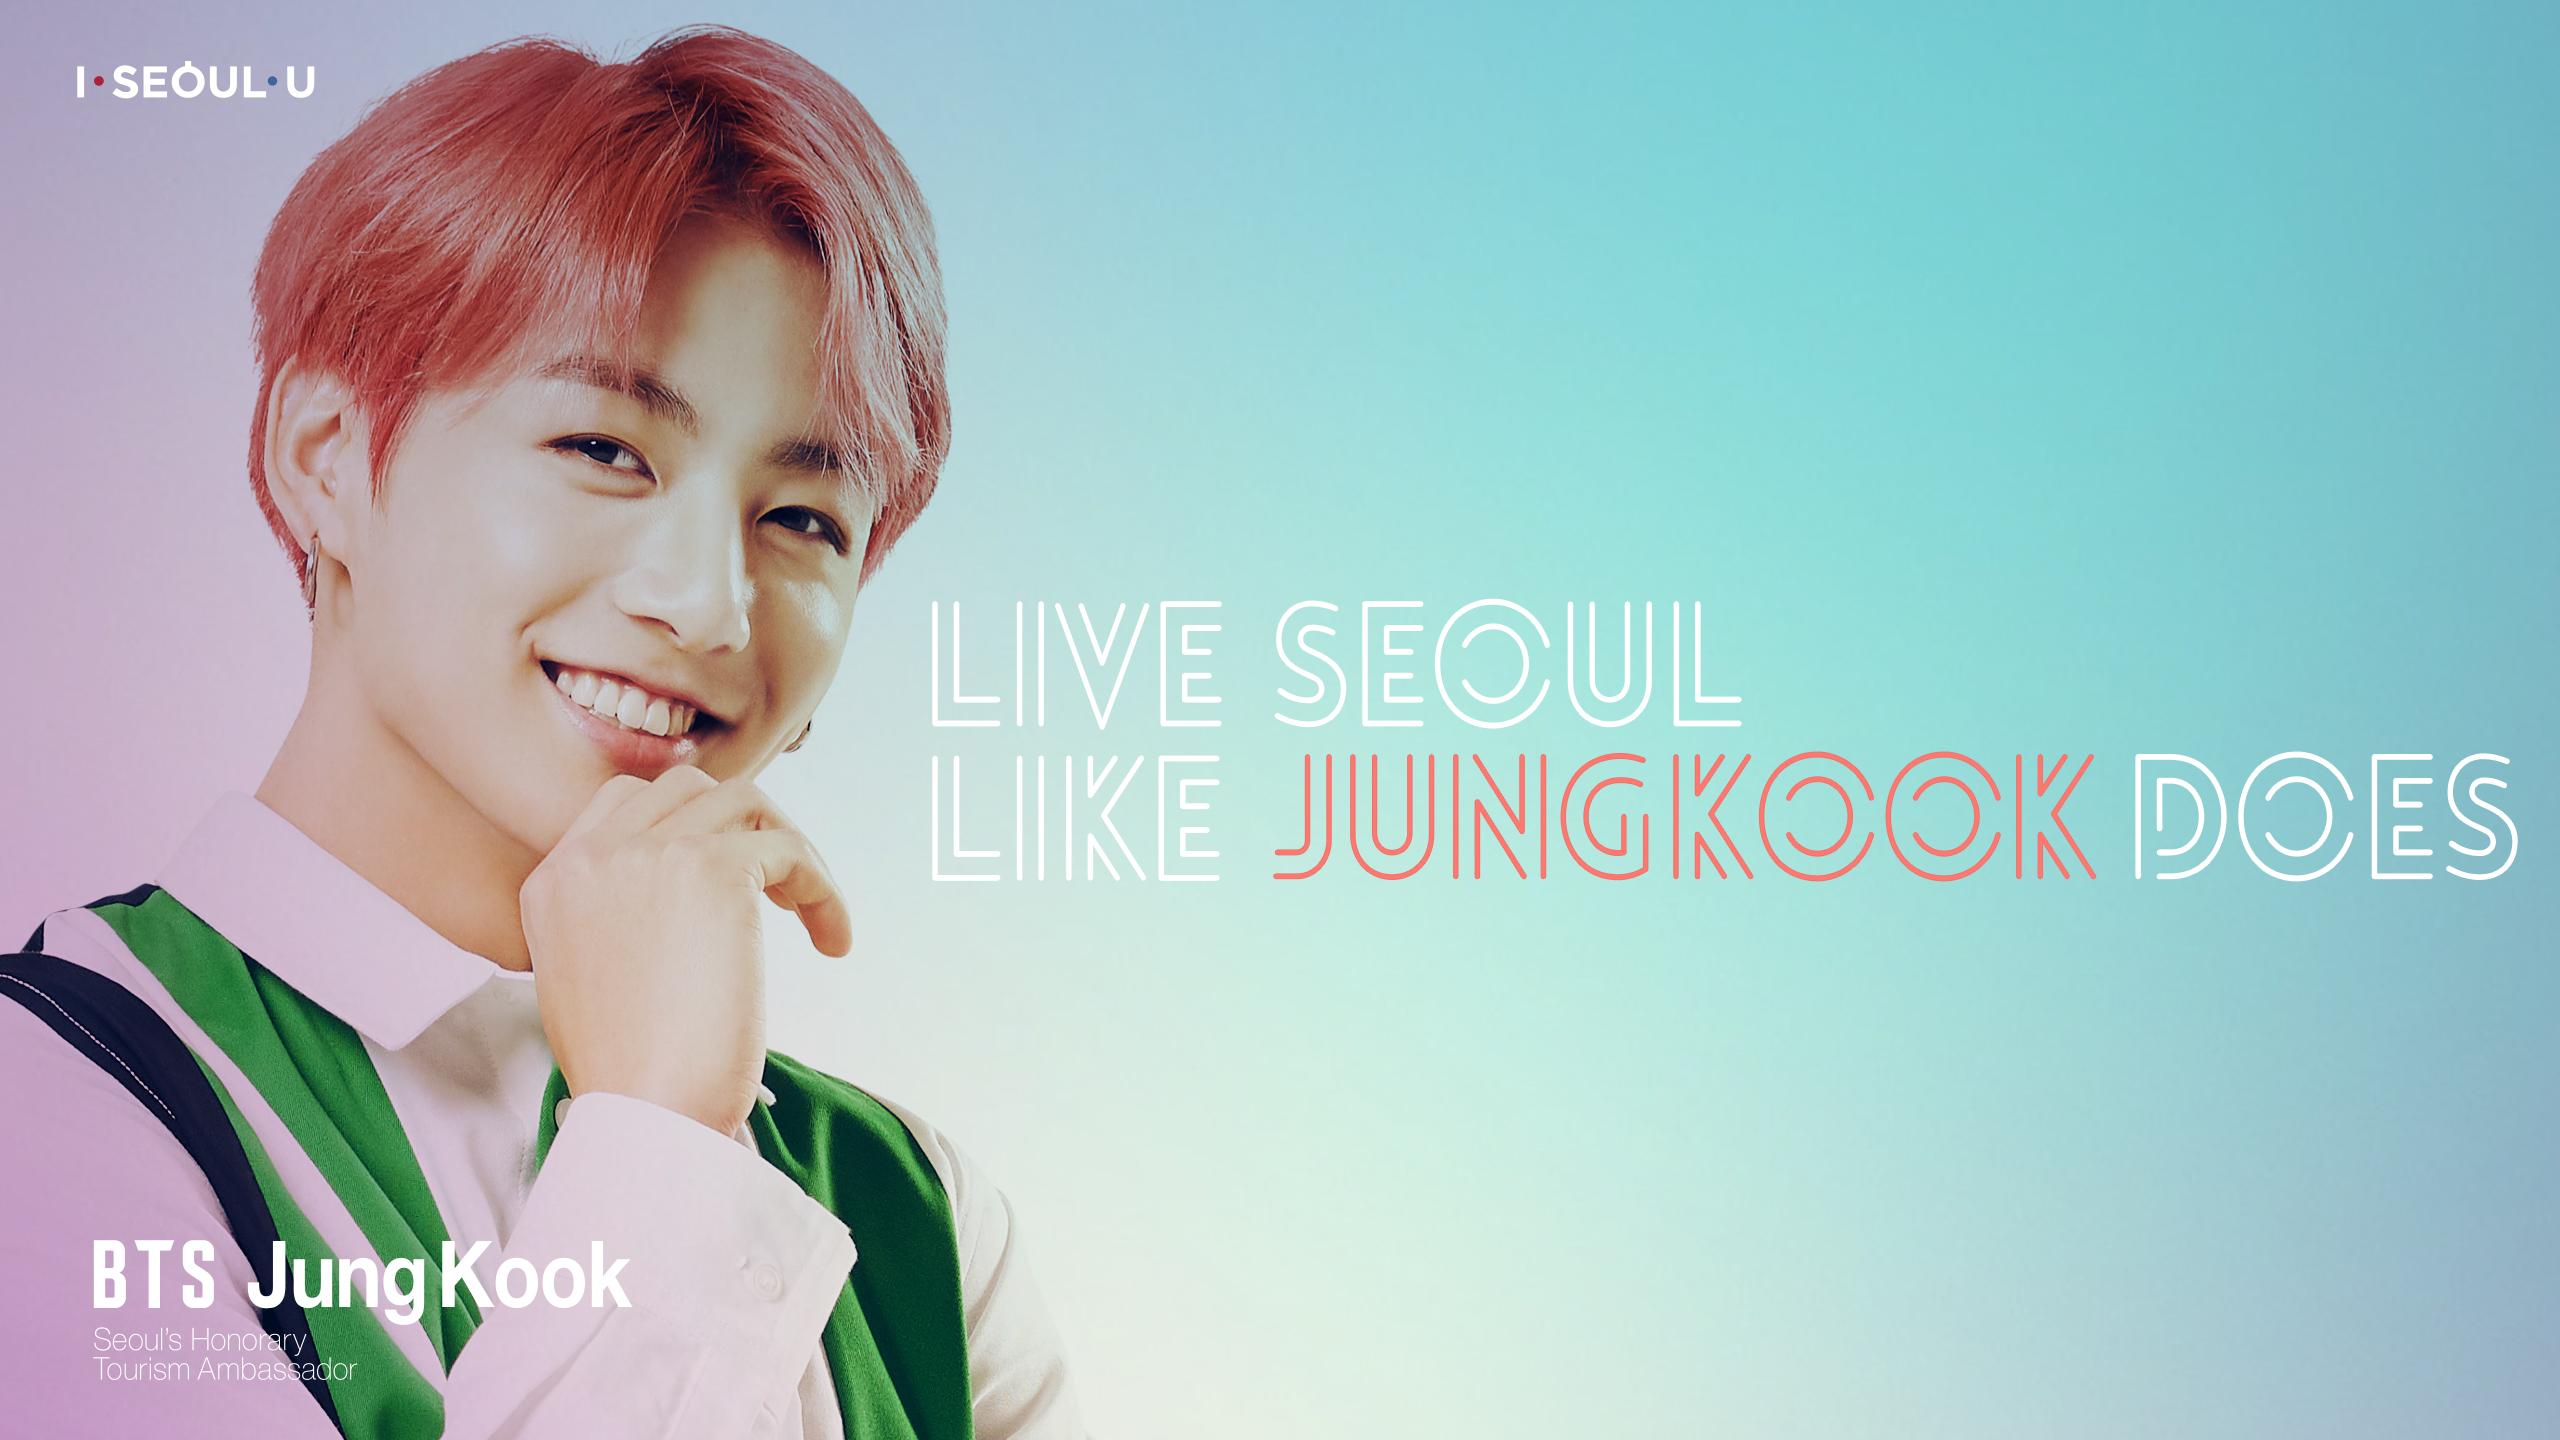 Wallpaper Pc 2560x1440 Bts Live Seoul Like I Do